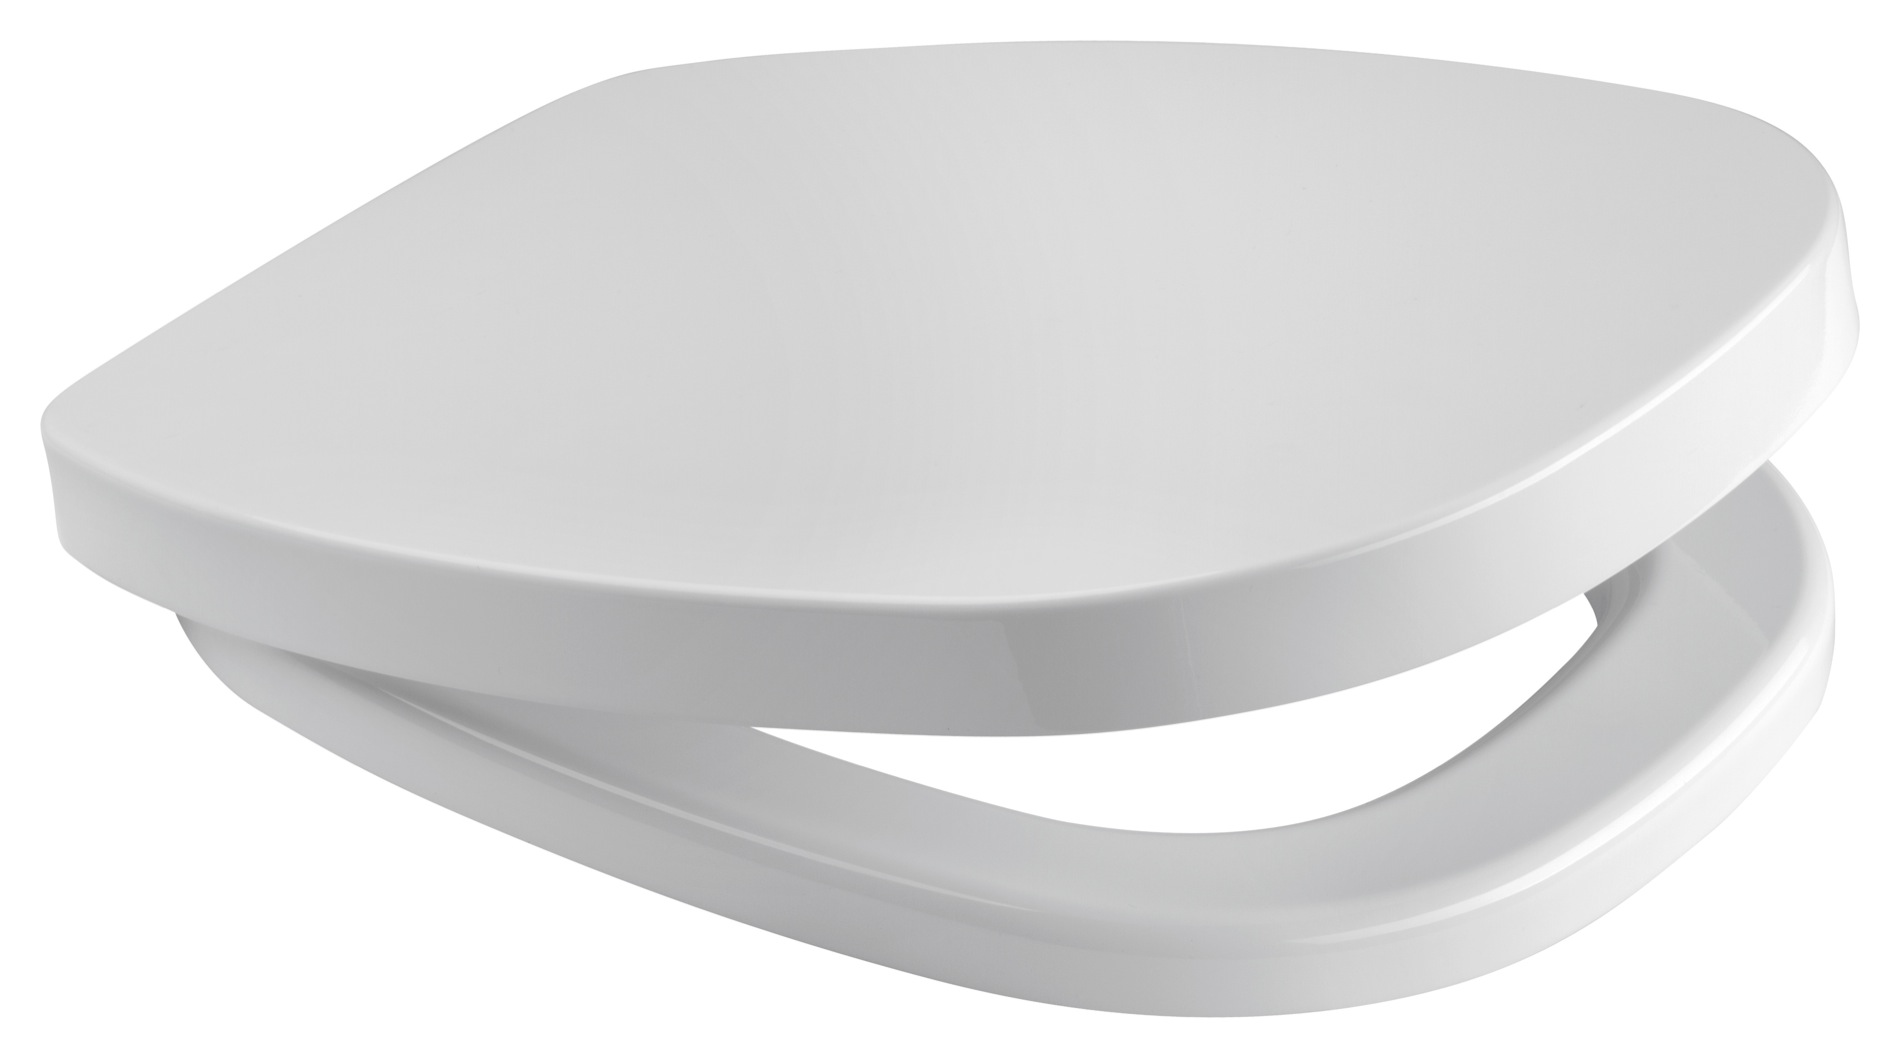 keramik h nge wc toilette 649999 tiefsp ler wandh ngend wand wc gratisversand ebay. Black Bedroom Furniture Sets. Home Design Ideas